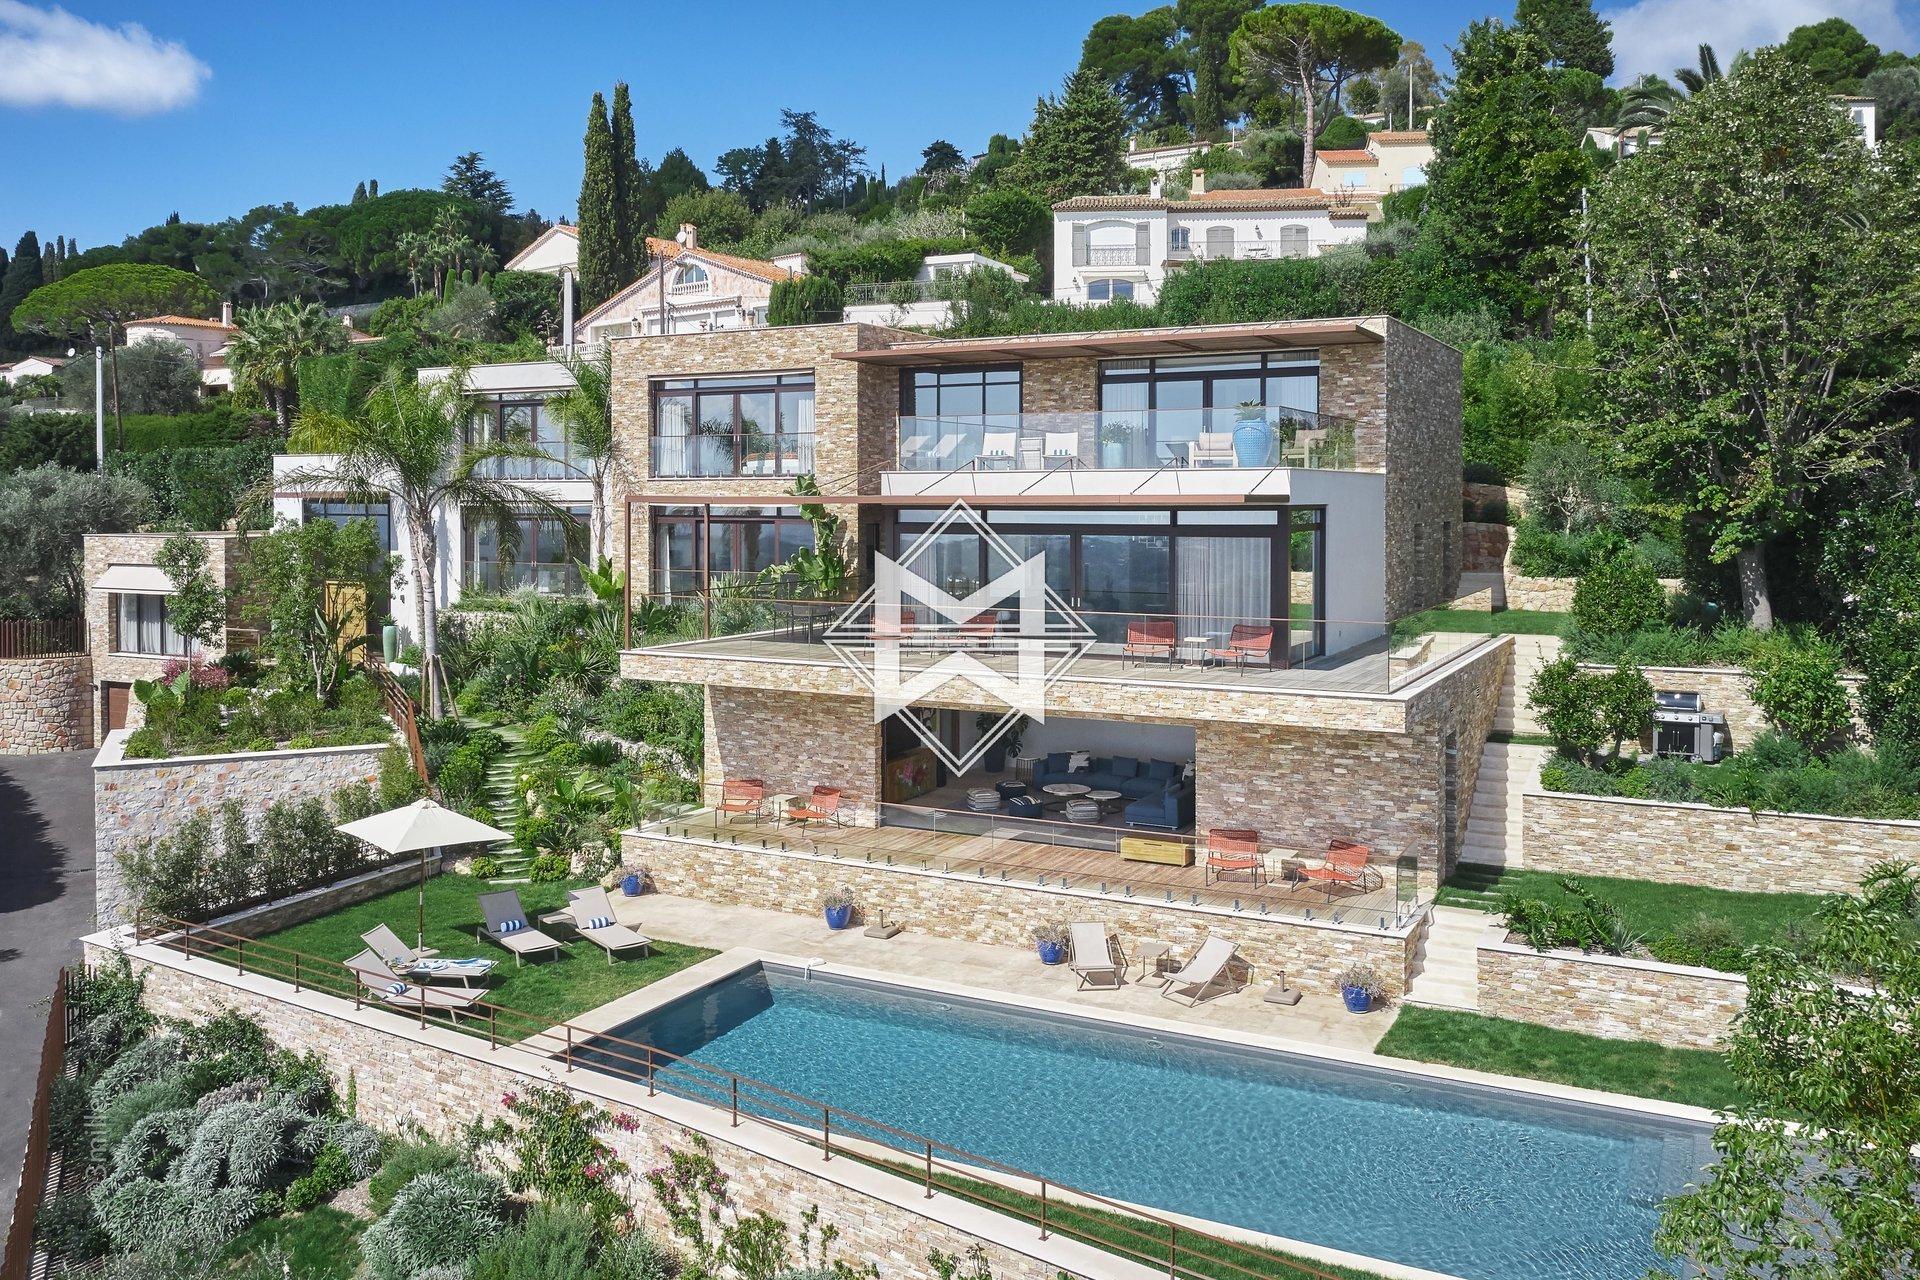 Villa in Mougins, Provence-Alpes-Côte d'Azur, France 1 - 10955370